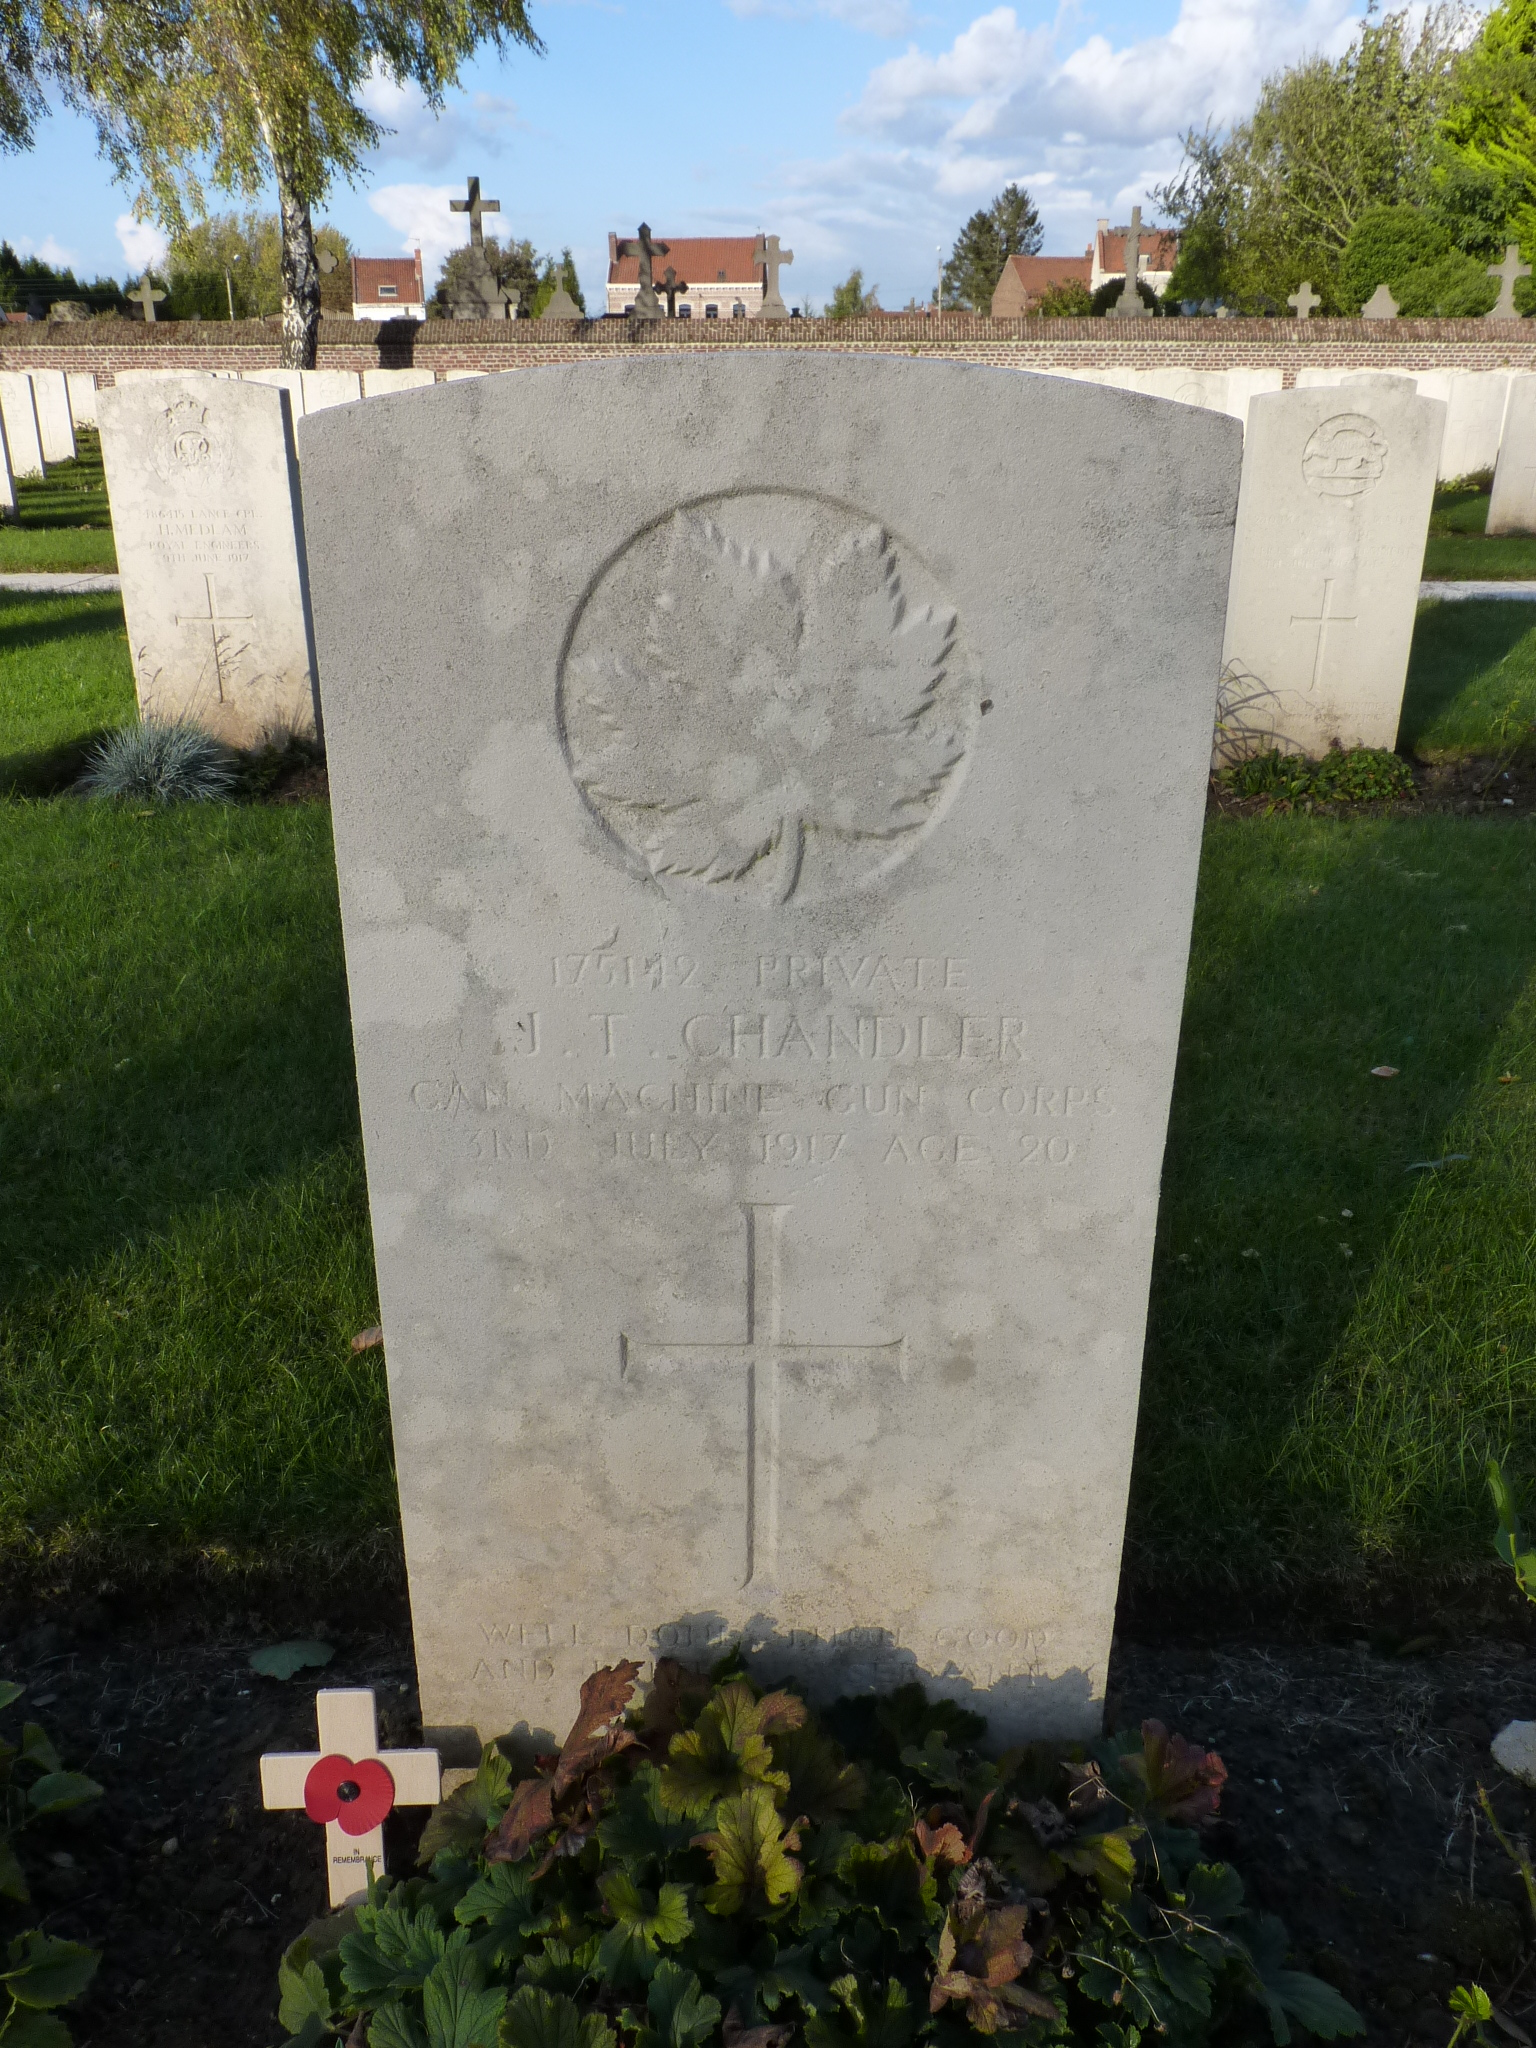 Grave marker– Grave photographed 23 October 2014 while on a trip to visit graves/memorials of former pupils at Framlingham College, Suffolk, England